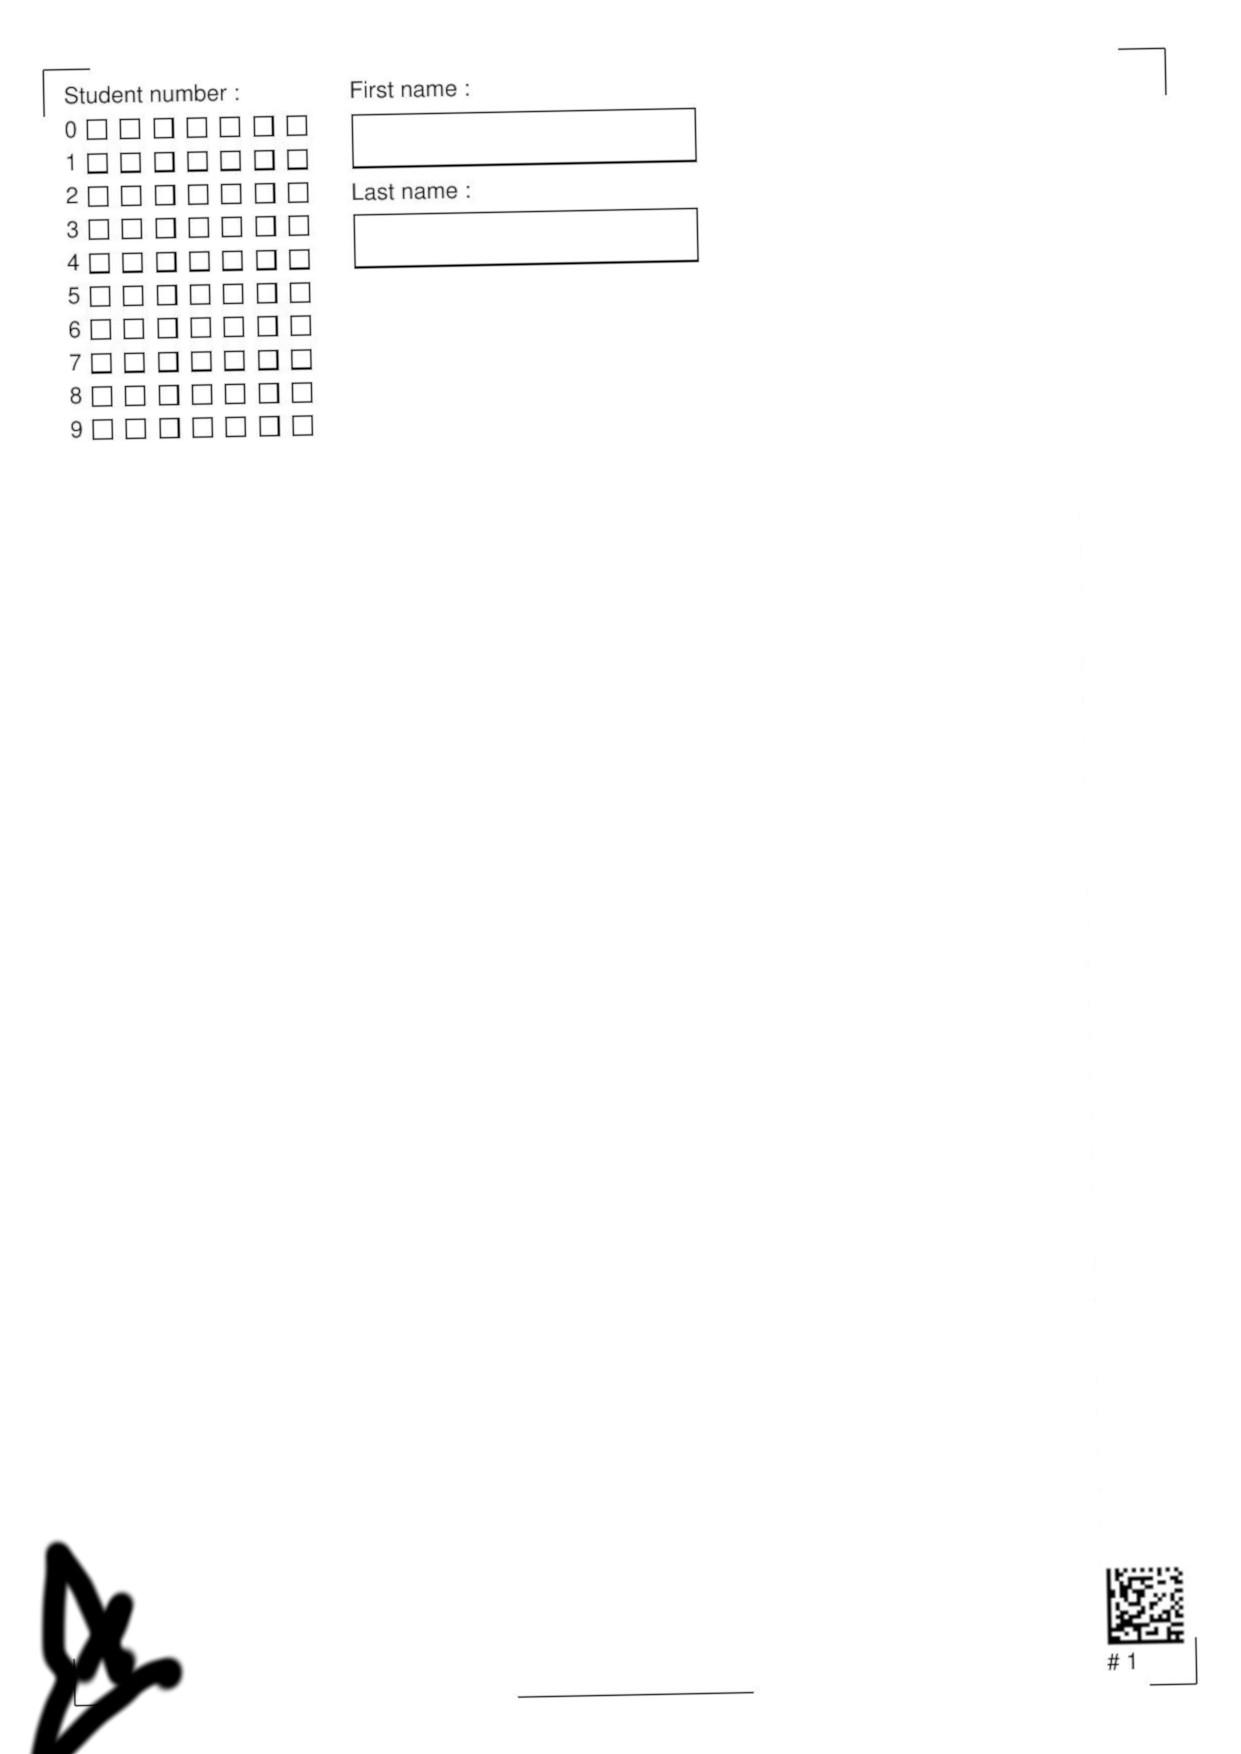 tests/data/scanned_pdfs/messy_three_corners.jpg